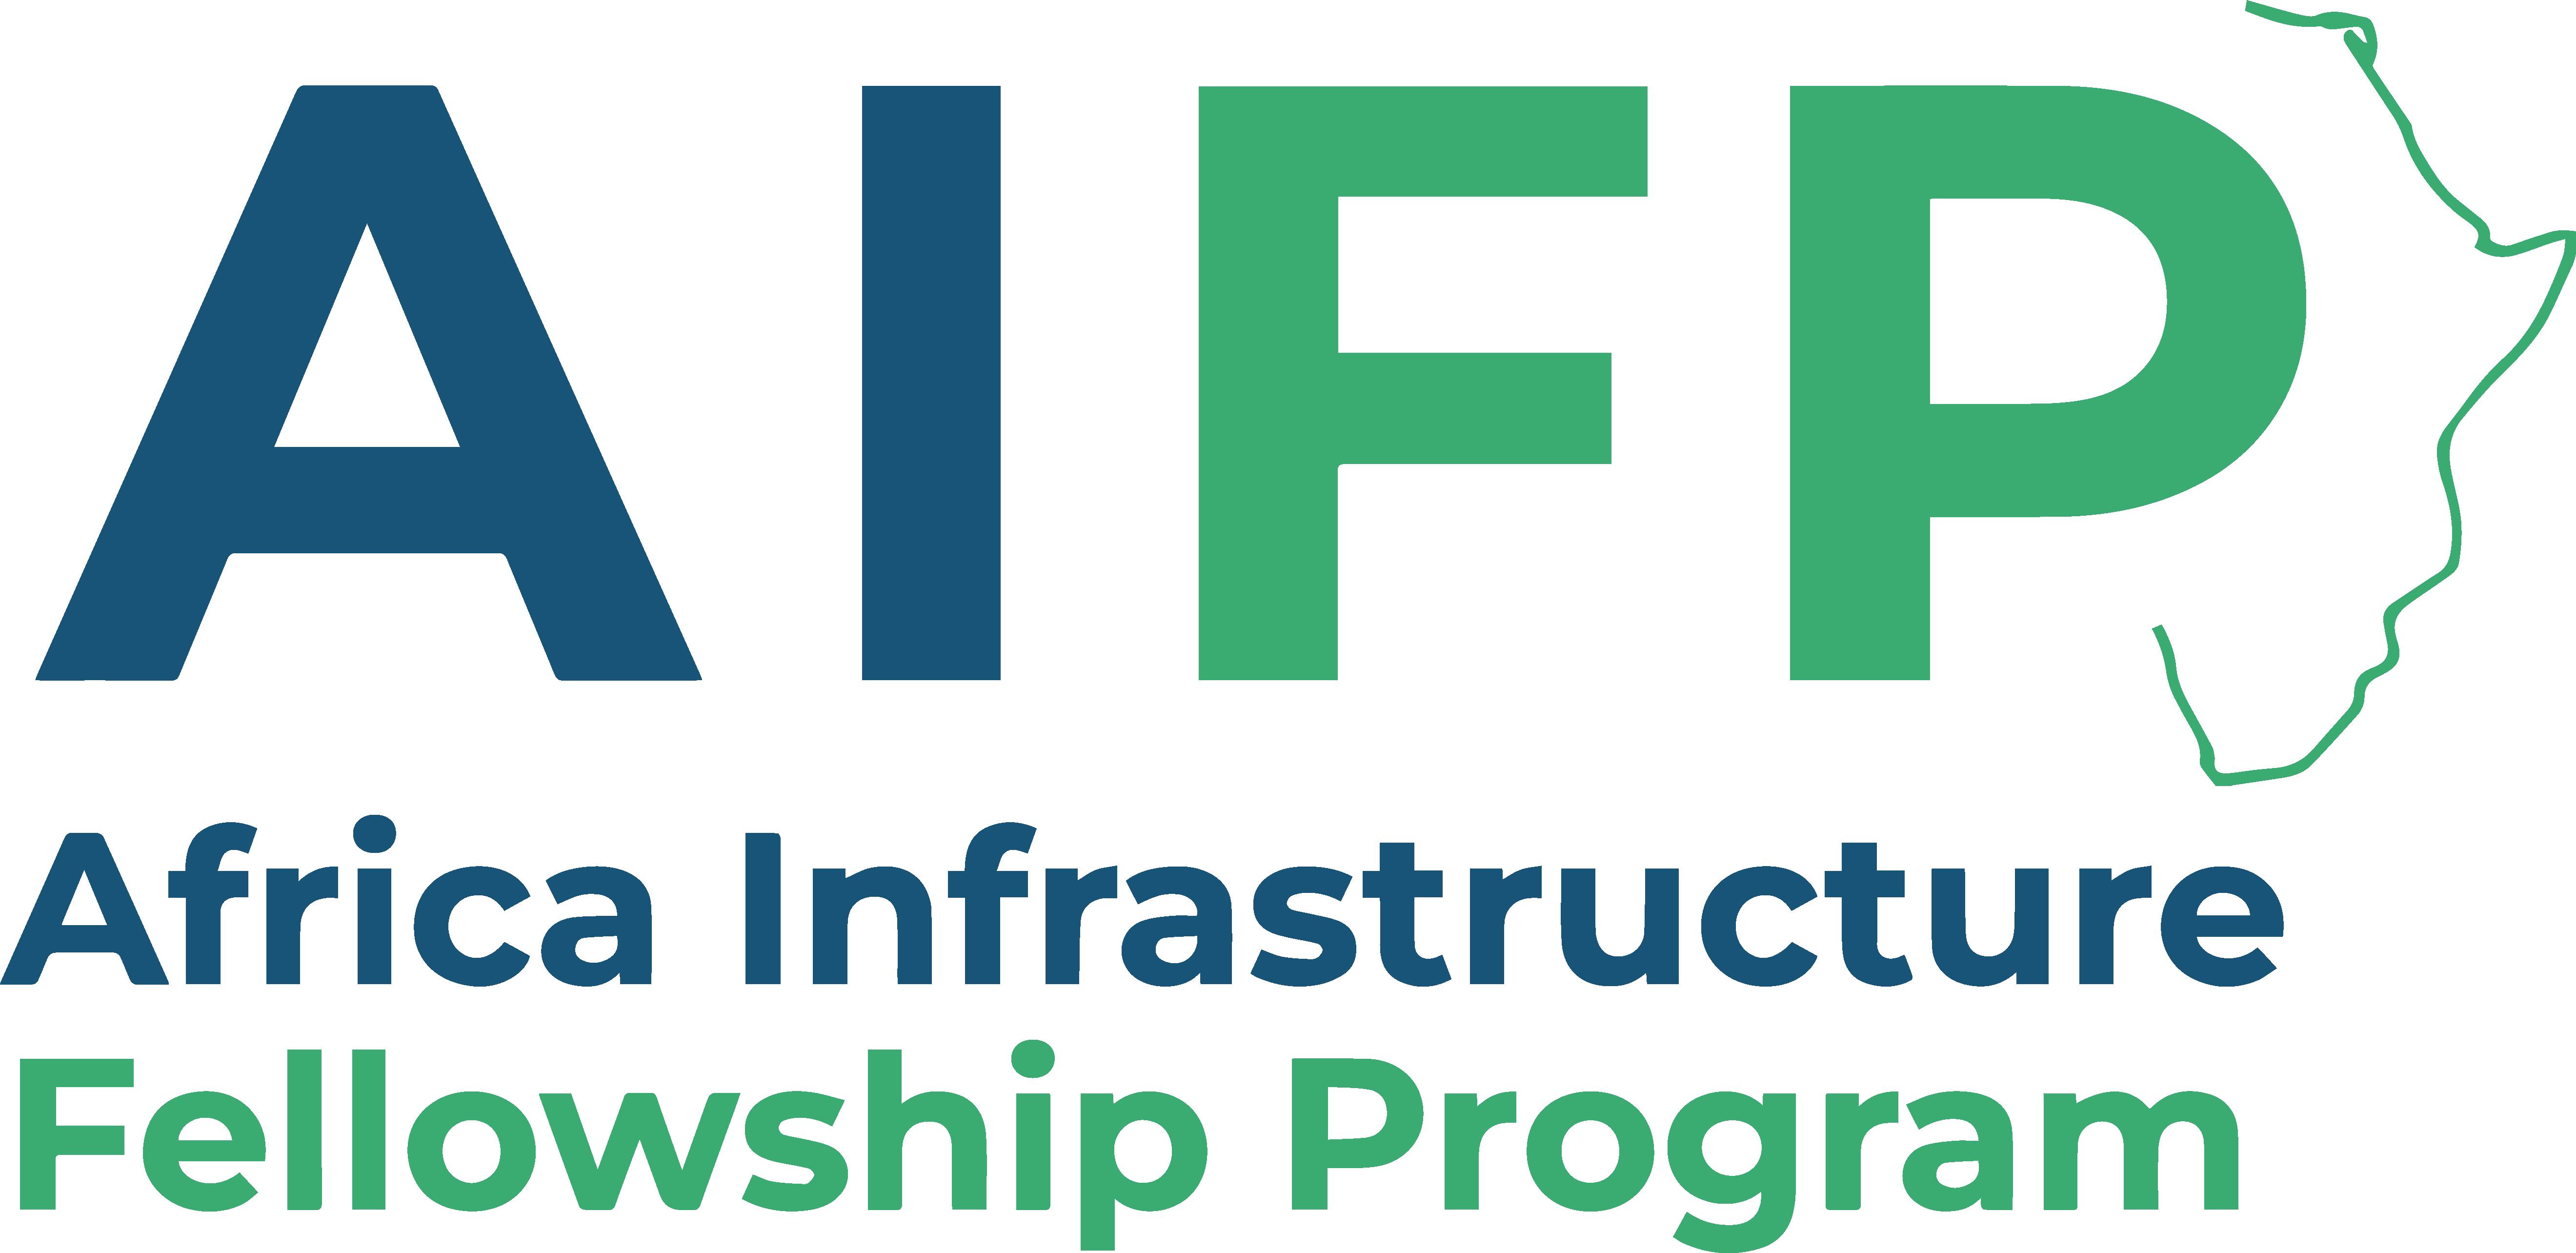 Africa Infrastructure Fellowship Program (English)